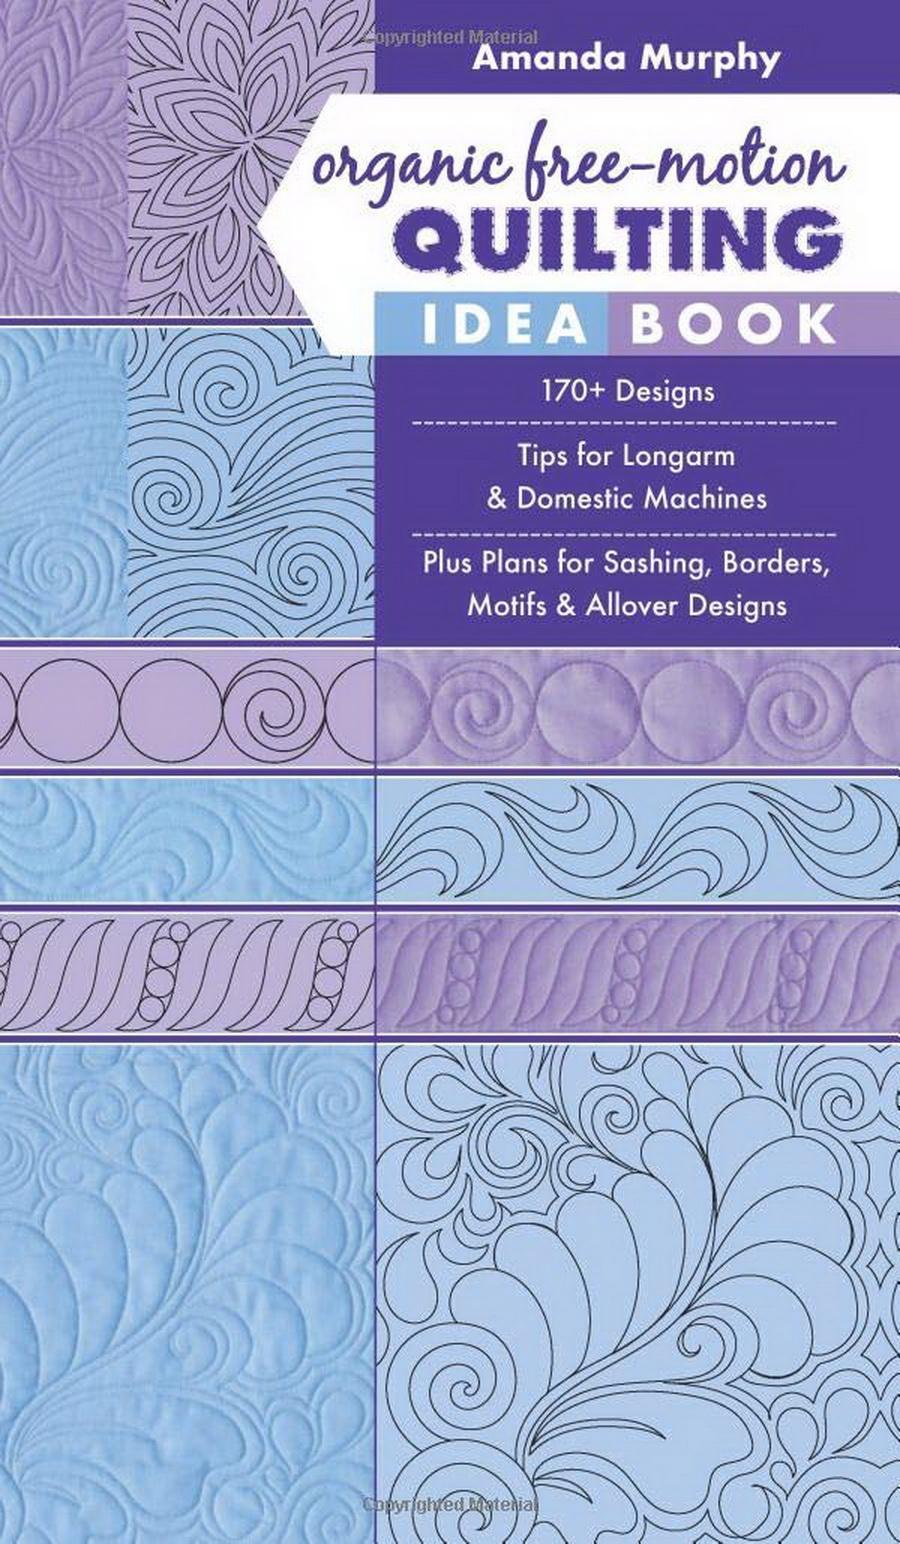 Organic Free-Motion Quilting Idea Book